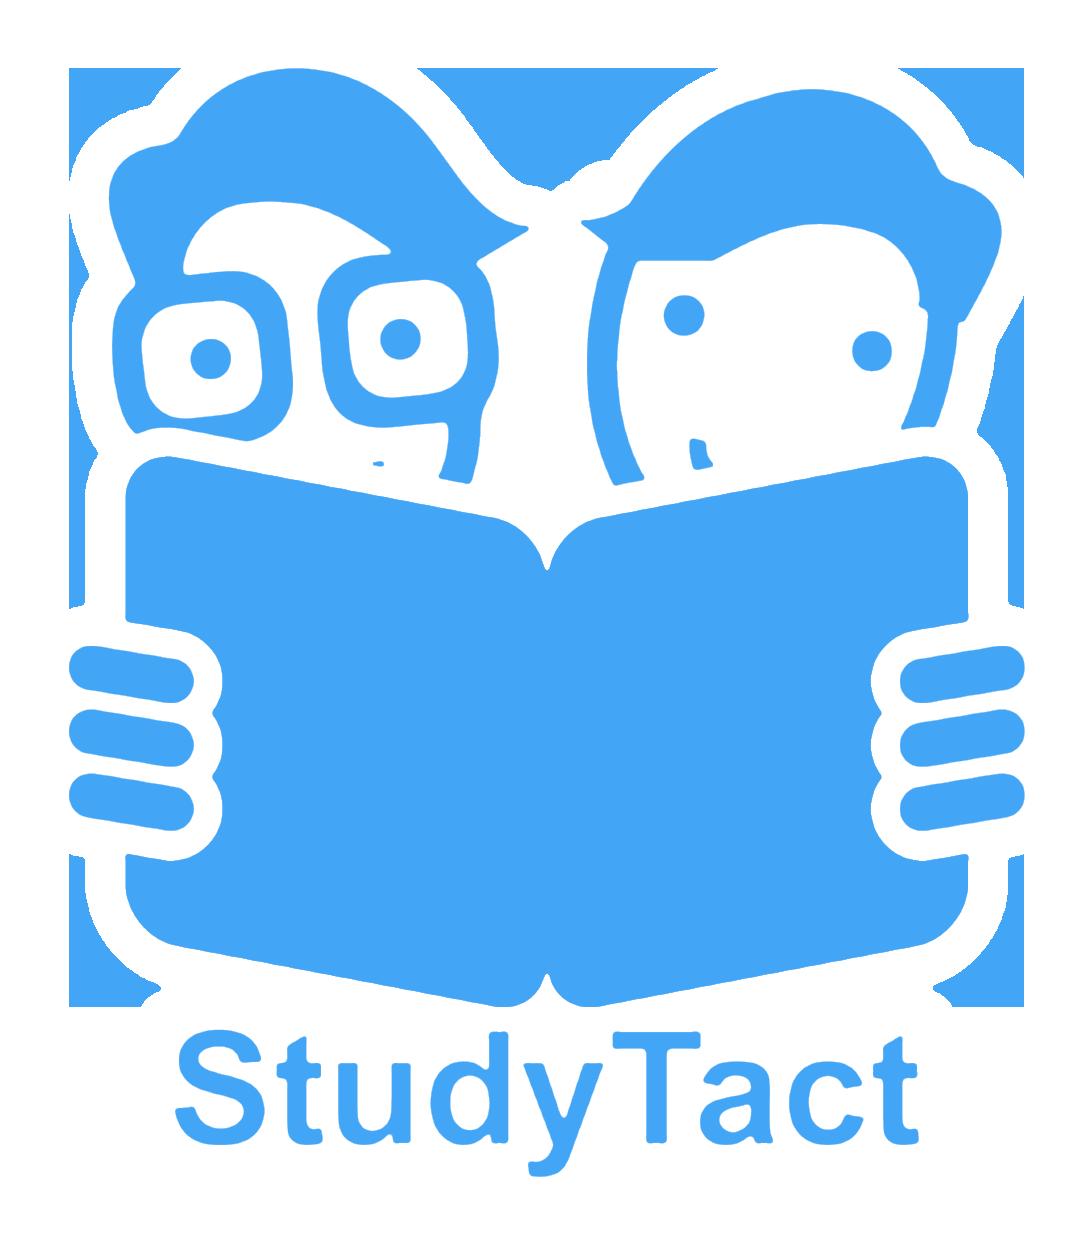 Studytact accounting tutor up. Debate clipart peer tutoring